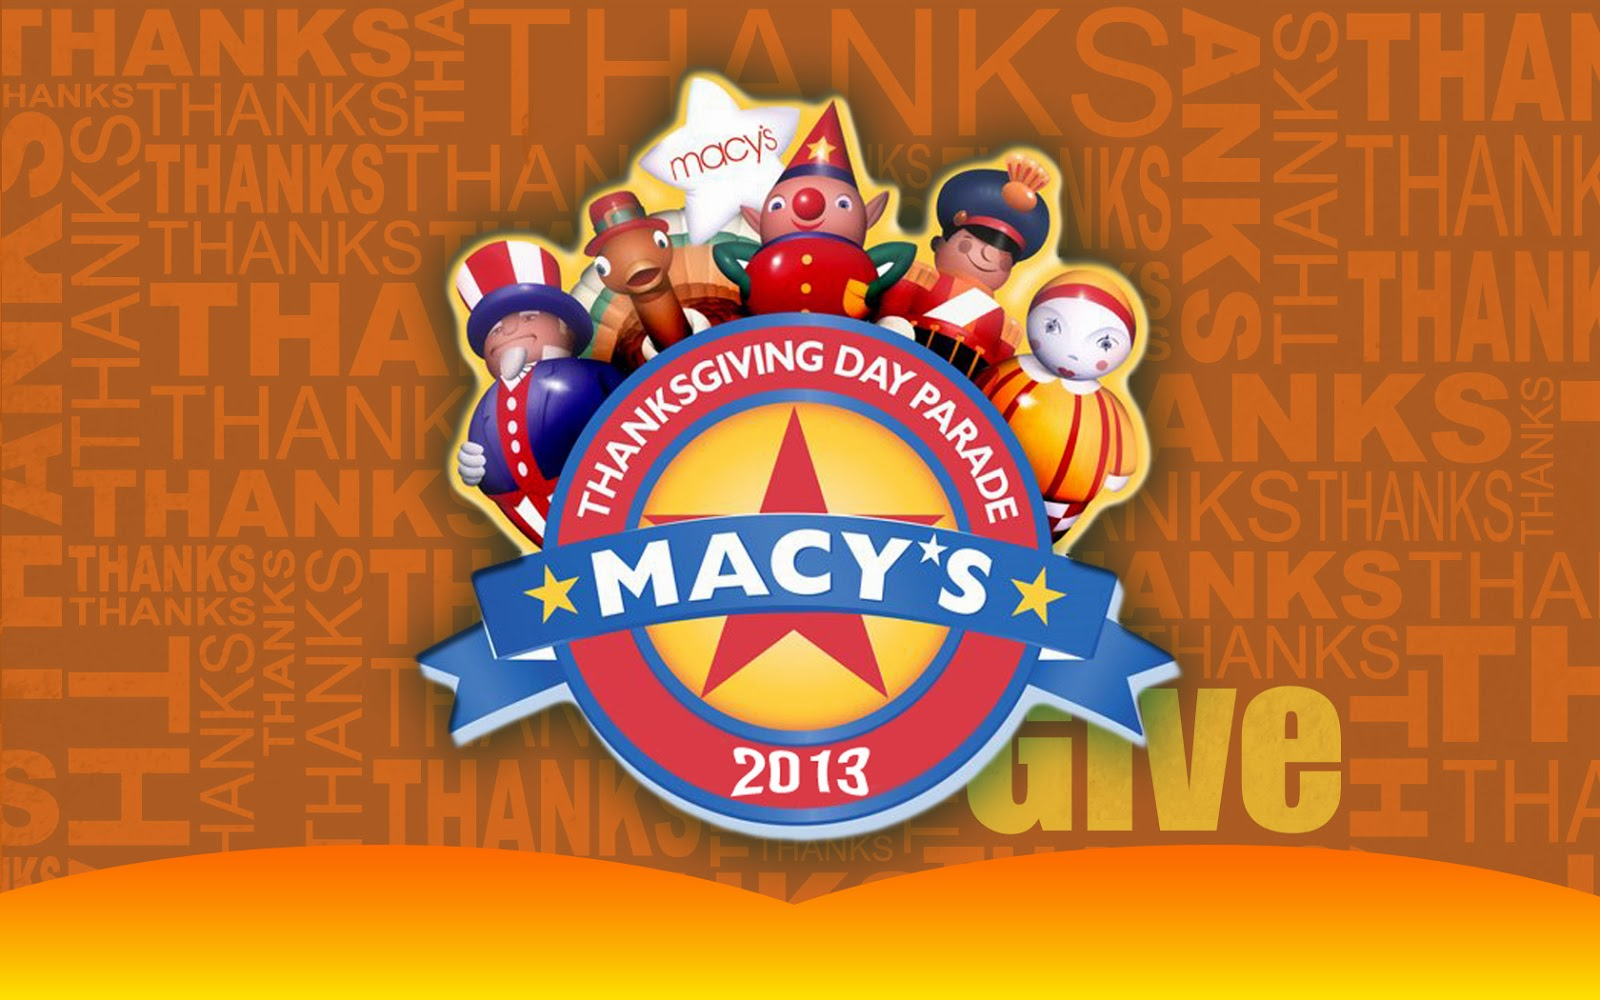 Macys Thanksgiving Day Parade 2013 Thanksgiving Wallpapers 1600x1000